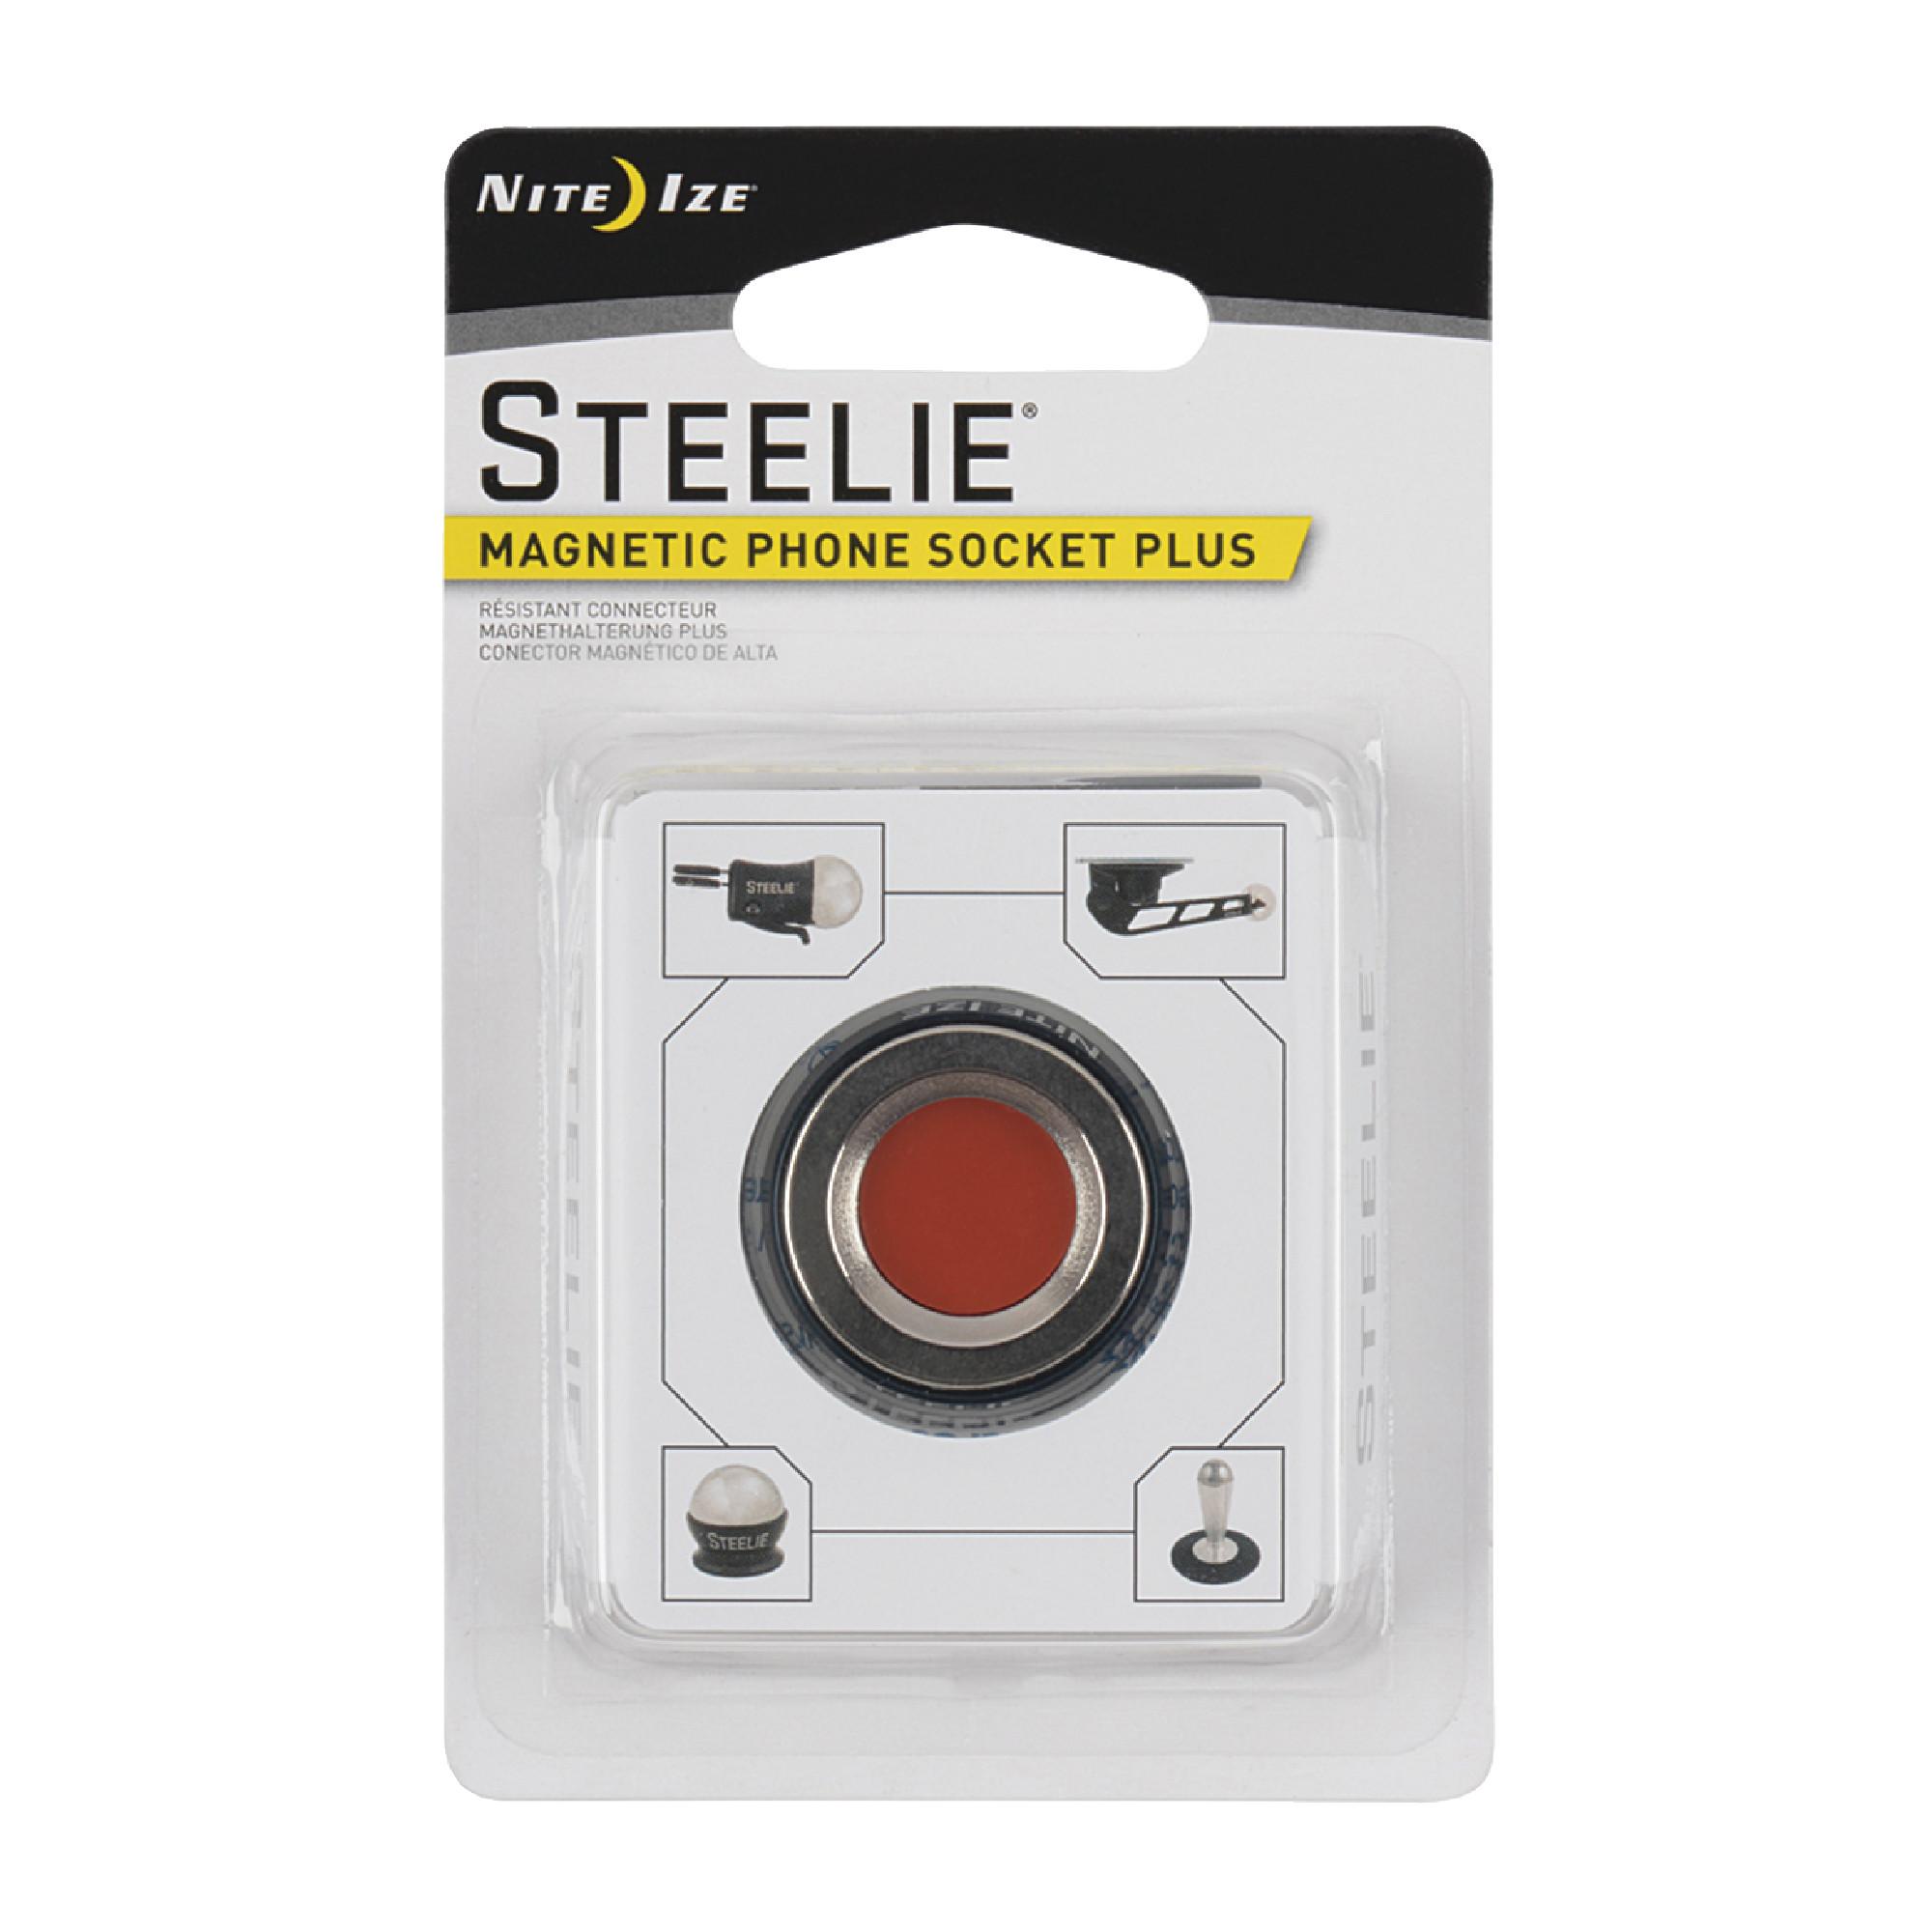 NITE IZE Steelie Magnetic Phone Socket Plus